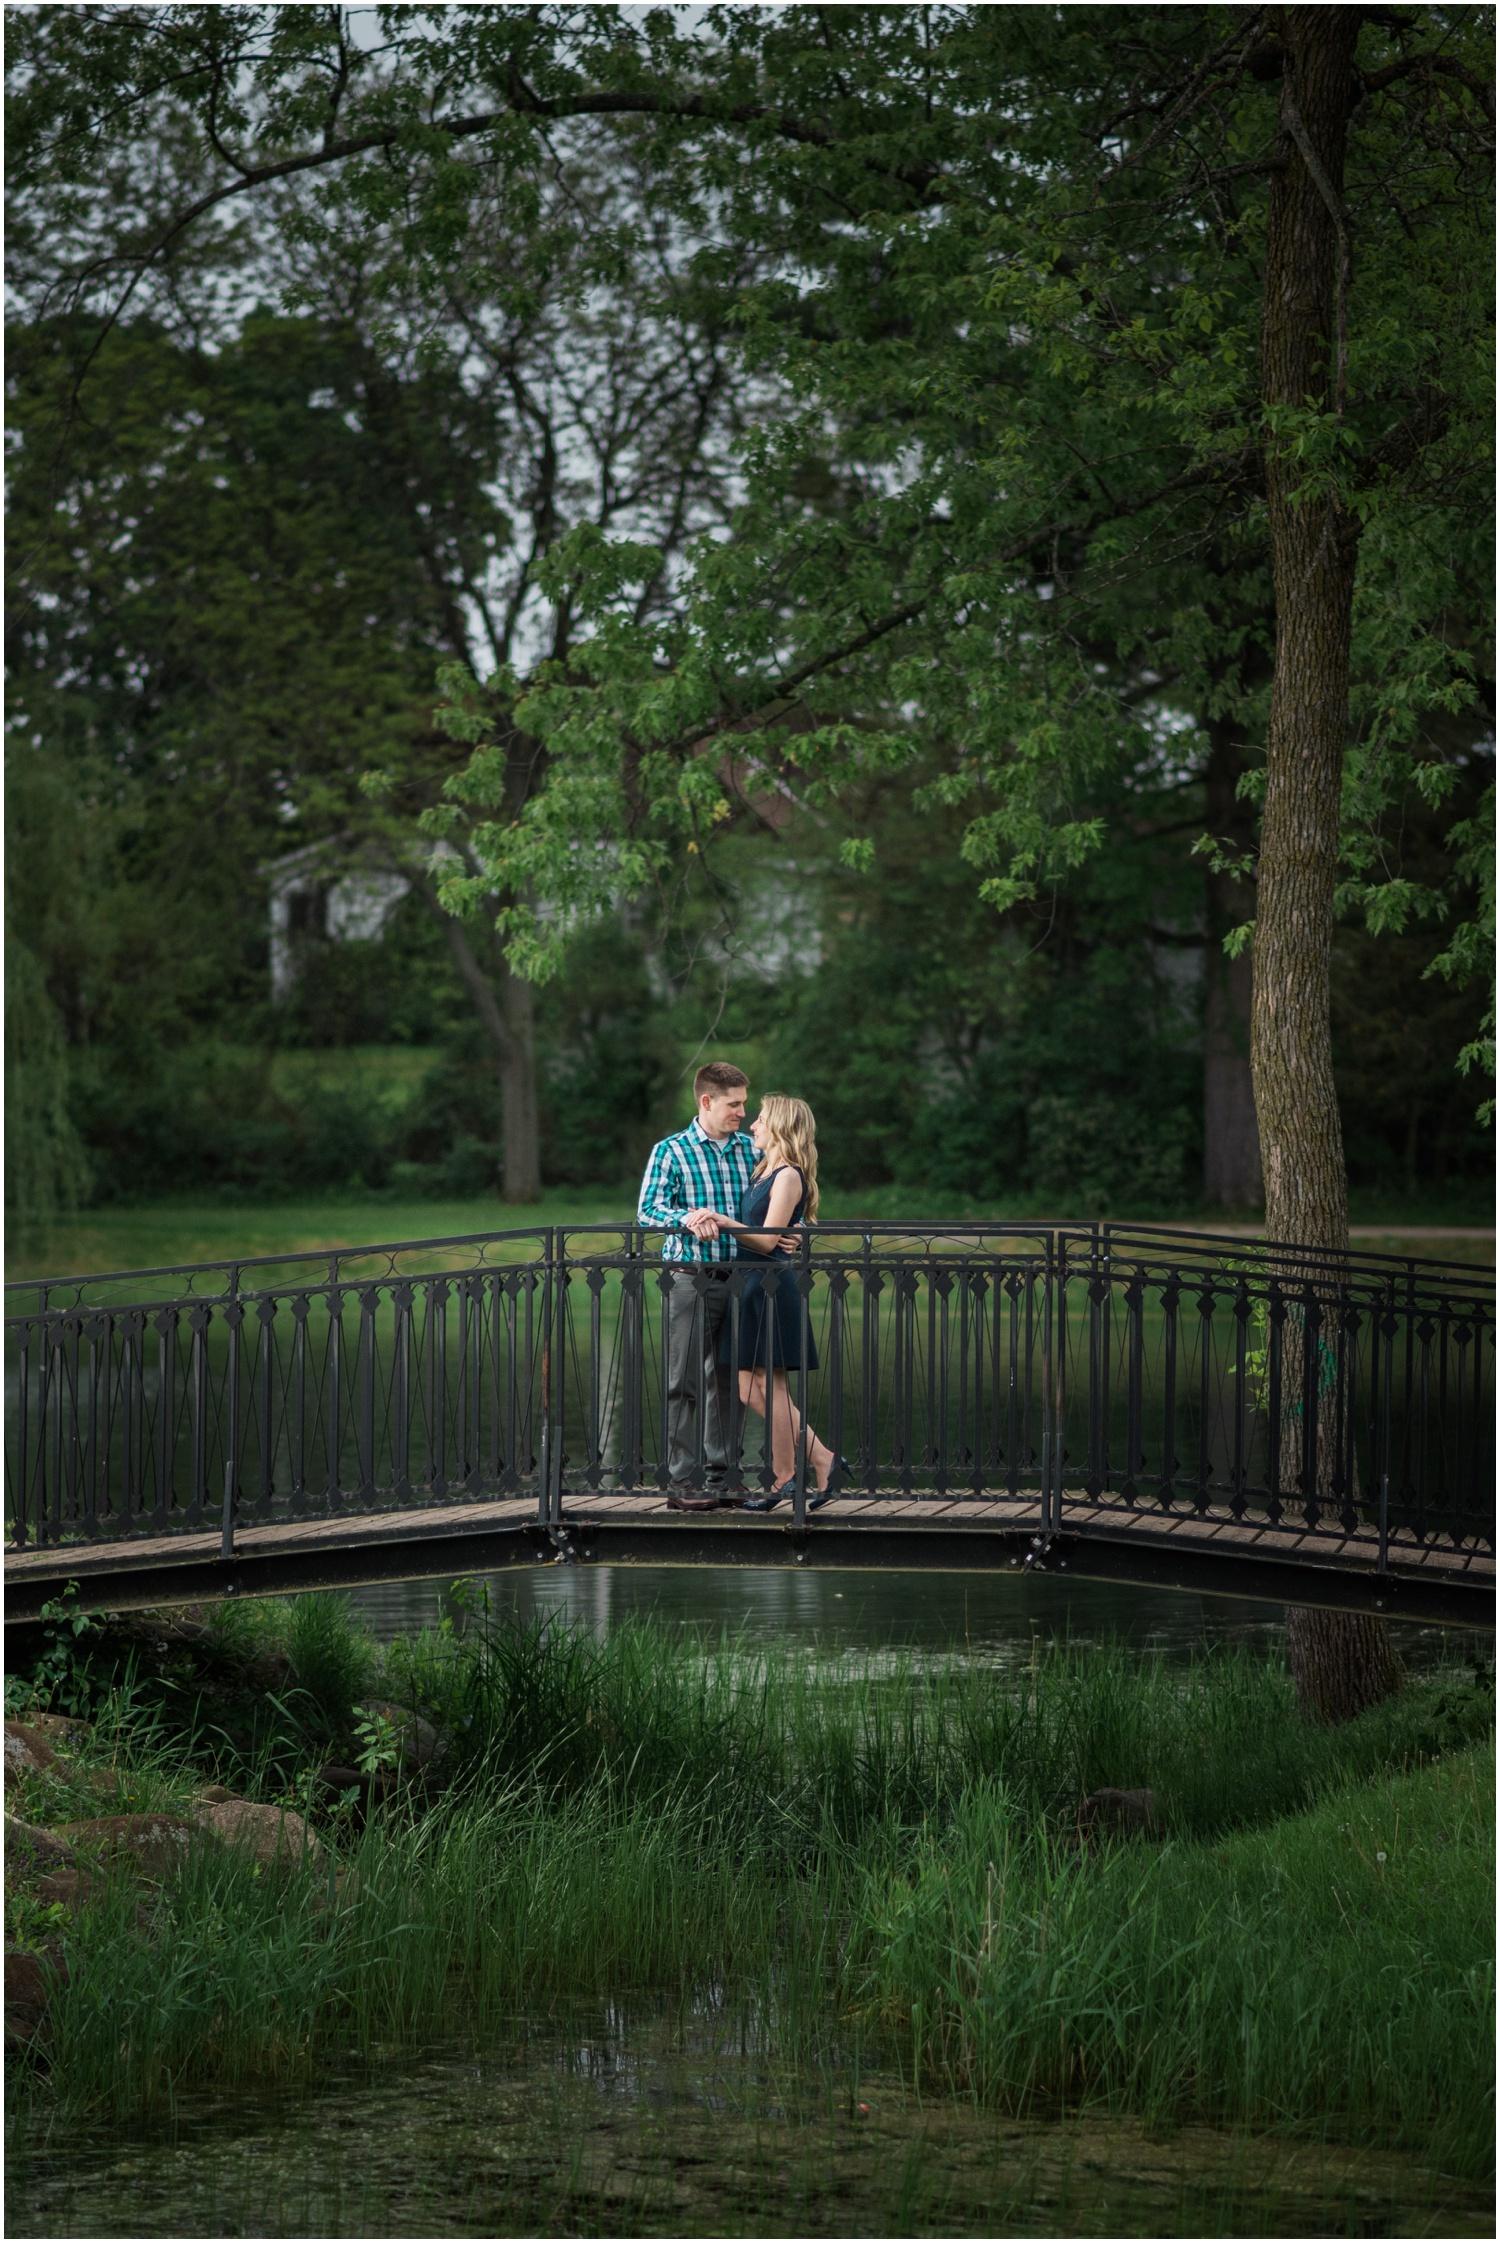 Paquette_Park_Portage_WI_Engagement_Photos_Heather_and_Derek_0023.jpg